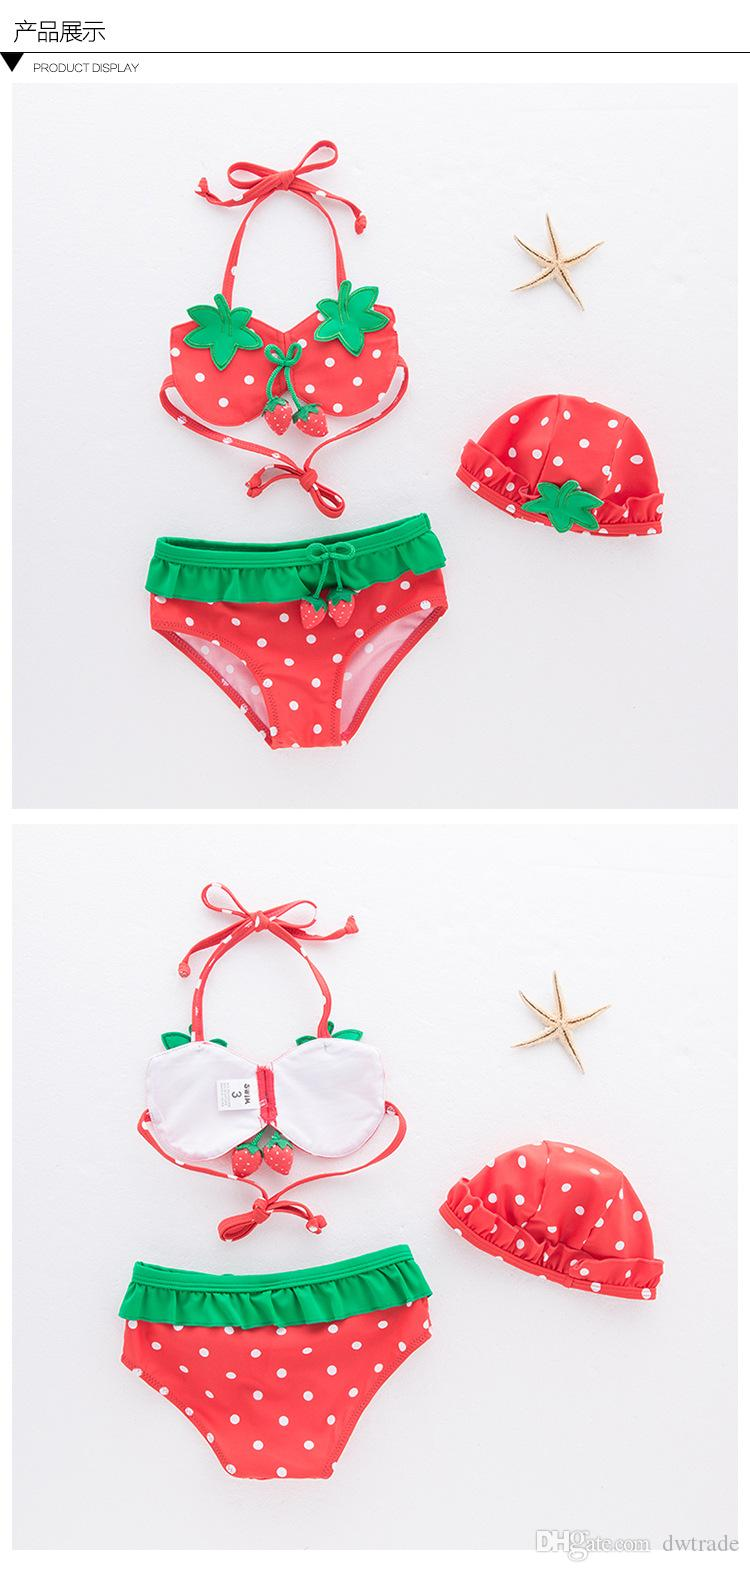 Cute Girls Strawberry Lace-Up Halter Hanging Neck Maillots de bain avec chapeau 3 Ensembles Bikini Spa Maillot de bain Fresh Sling Swimwear